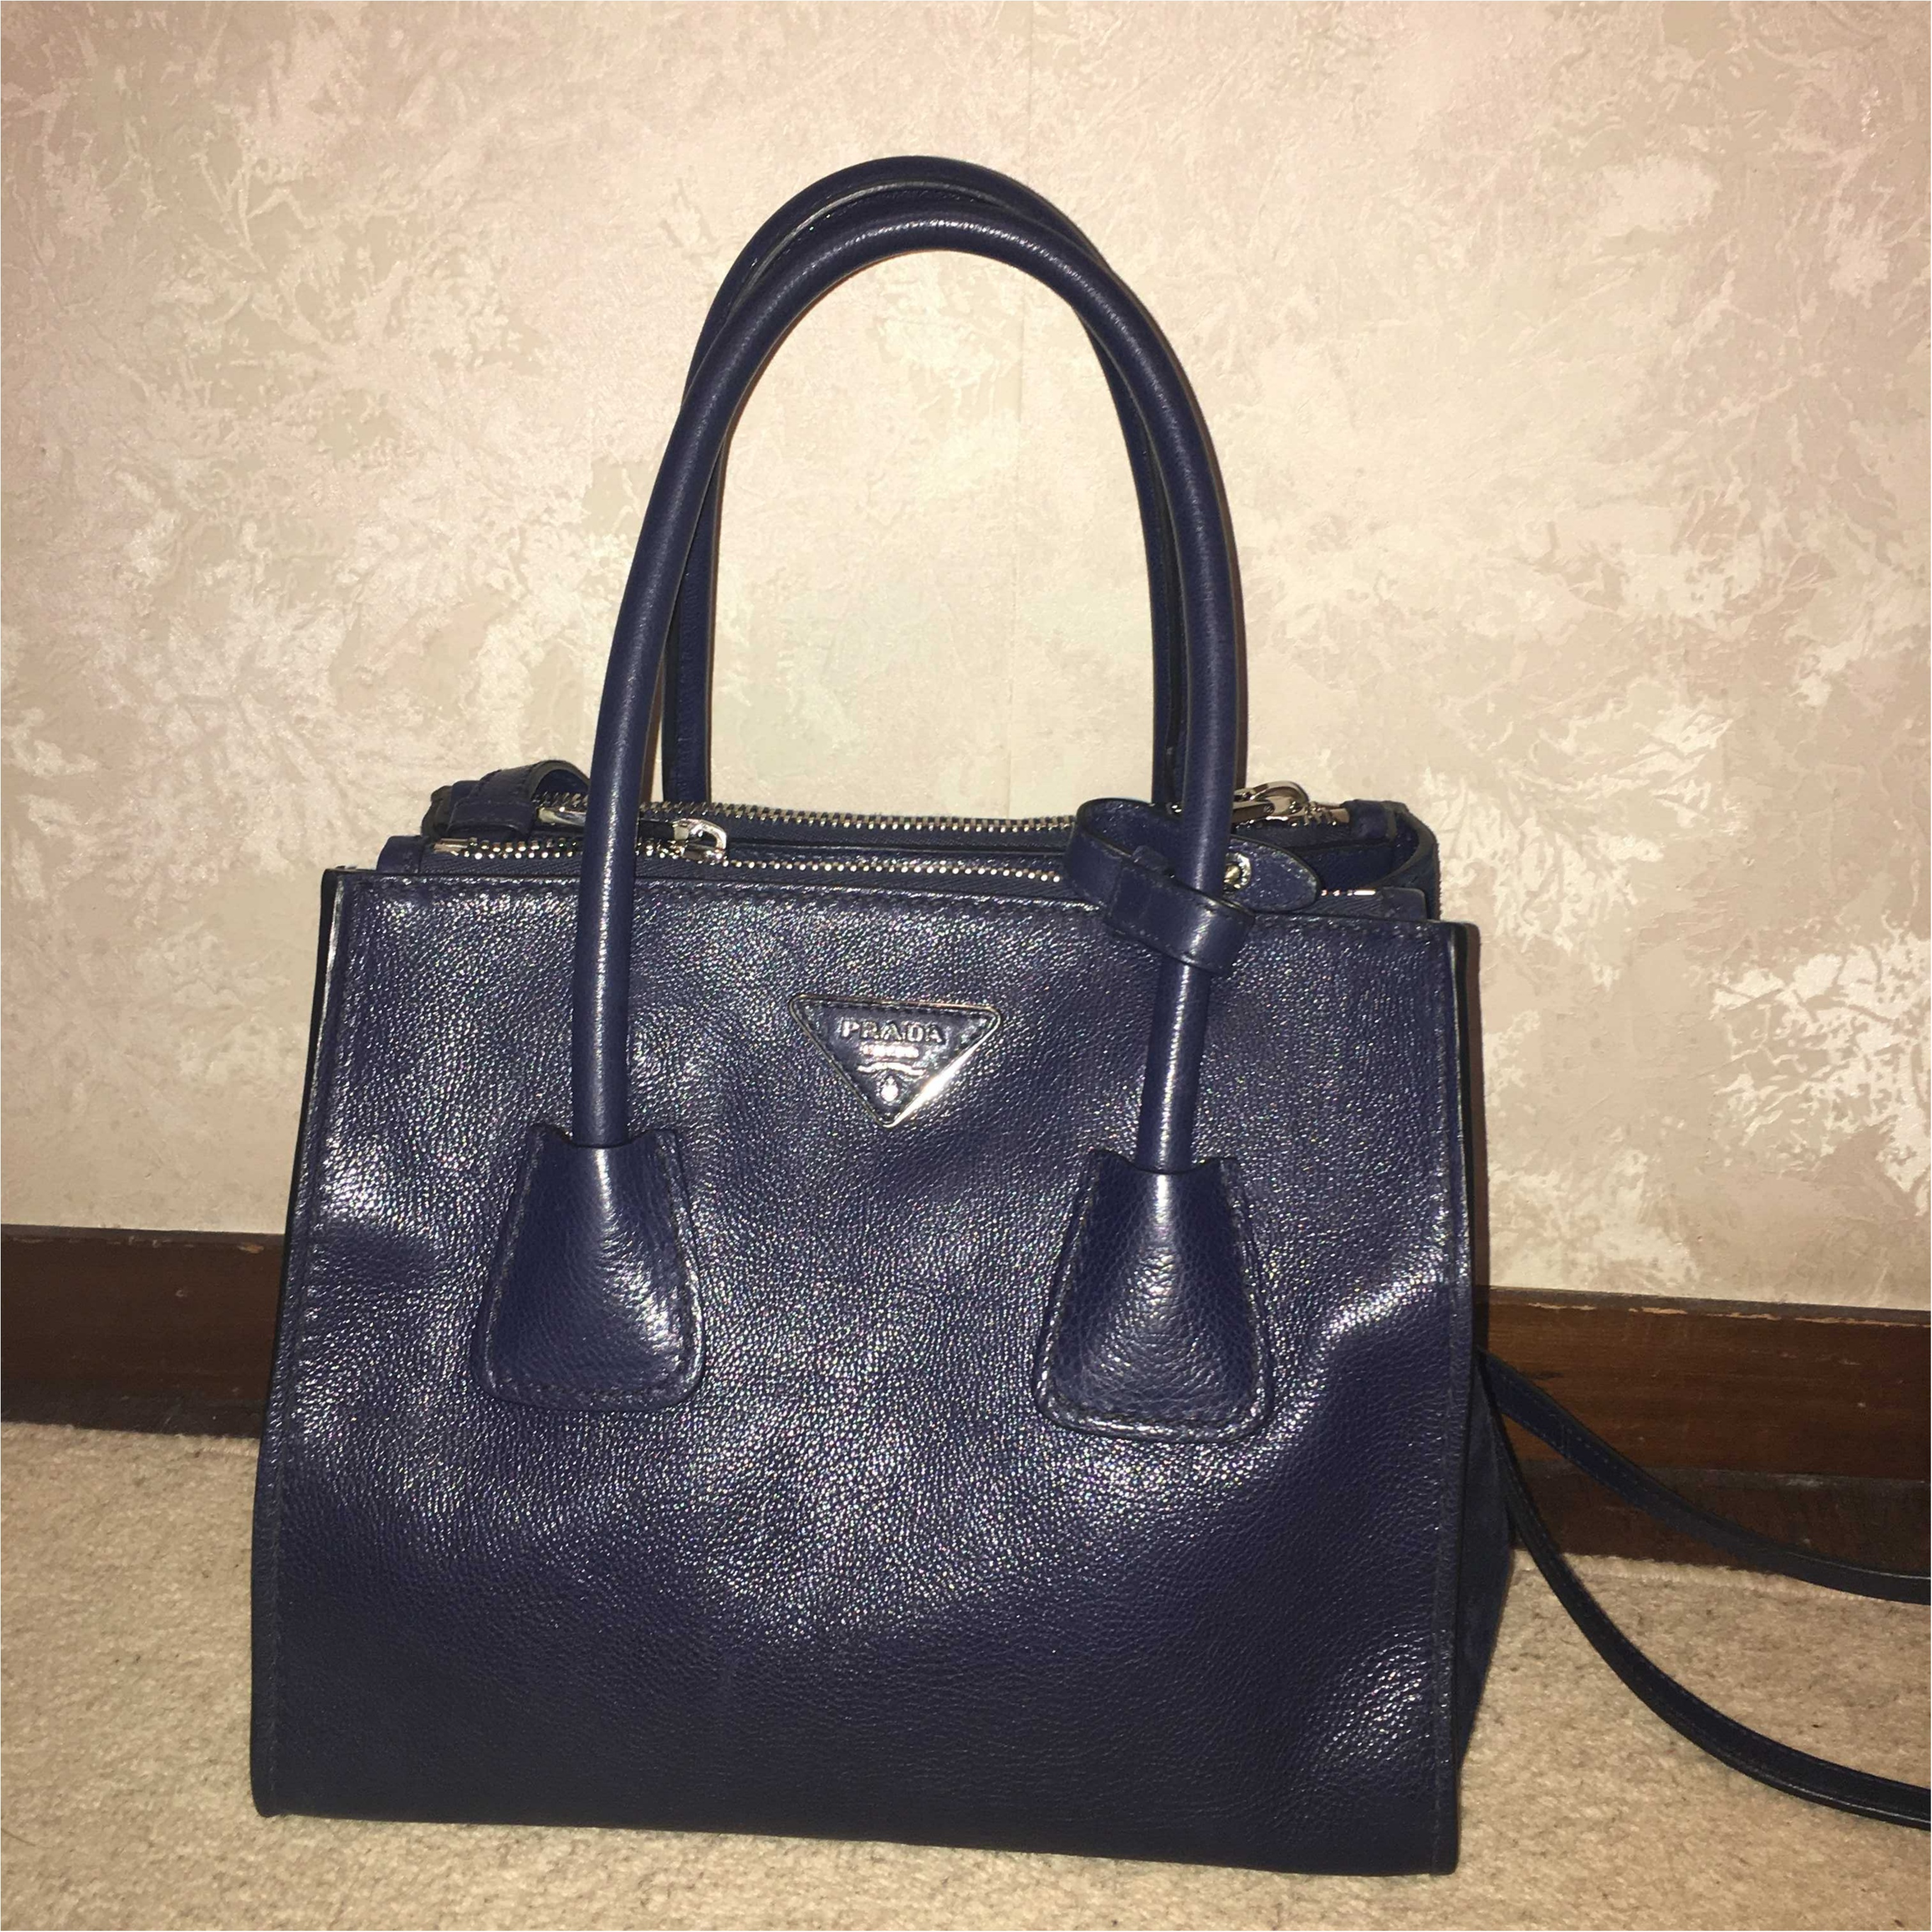 PRADAのバッグ!使いやすくて可愛い優秀なバッグです^_^_2